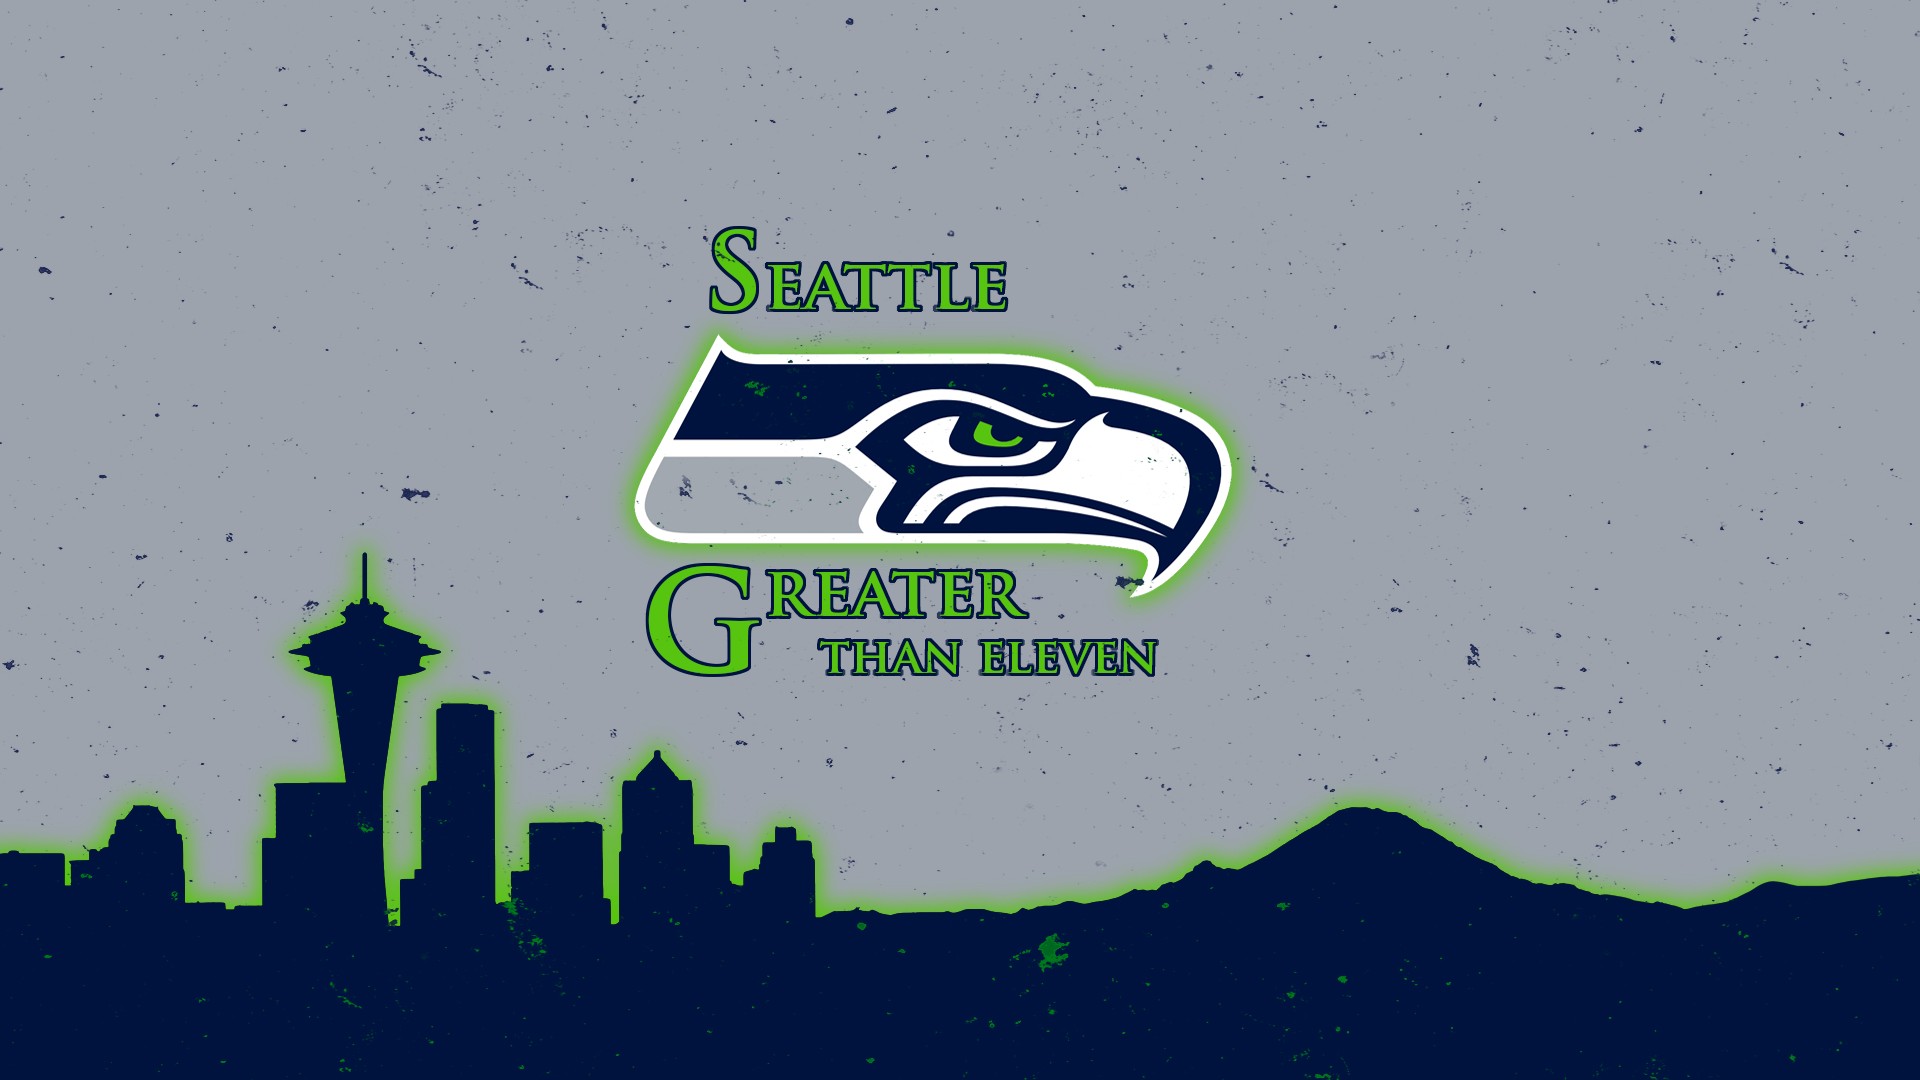 50 Seattle Seahawks Iphone Wallpaper On Wallpapersafari